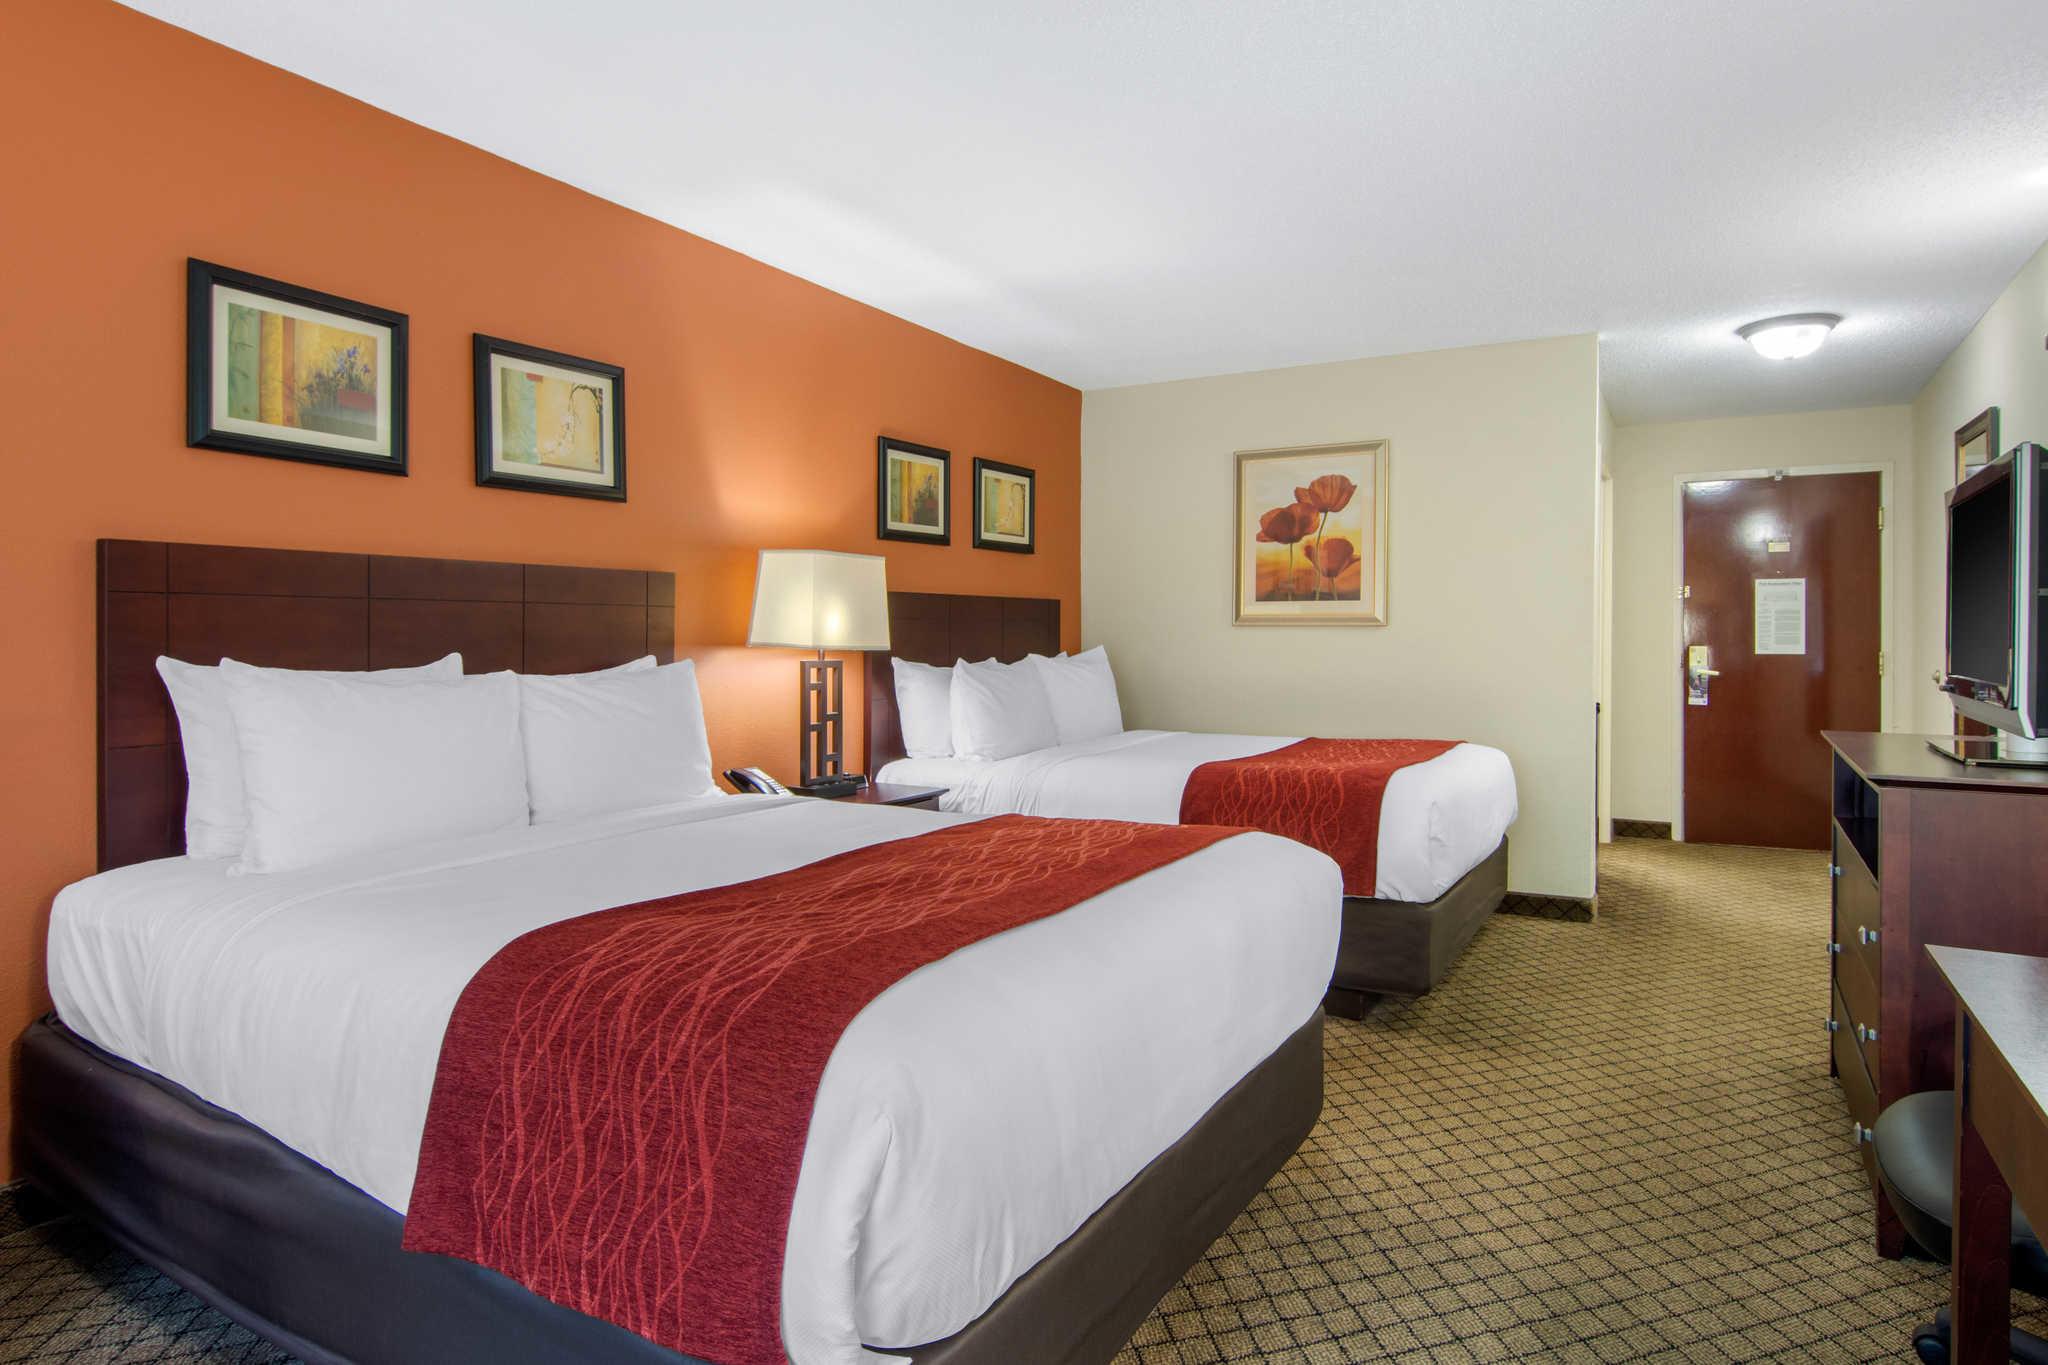 Comfort Inn & Suites image 17